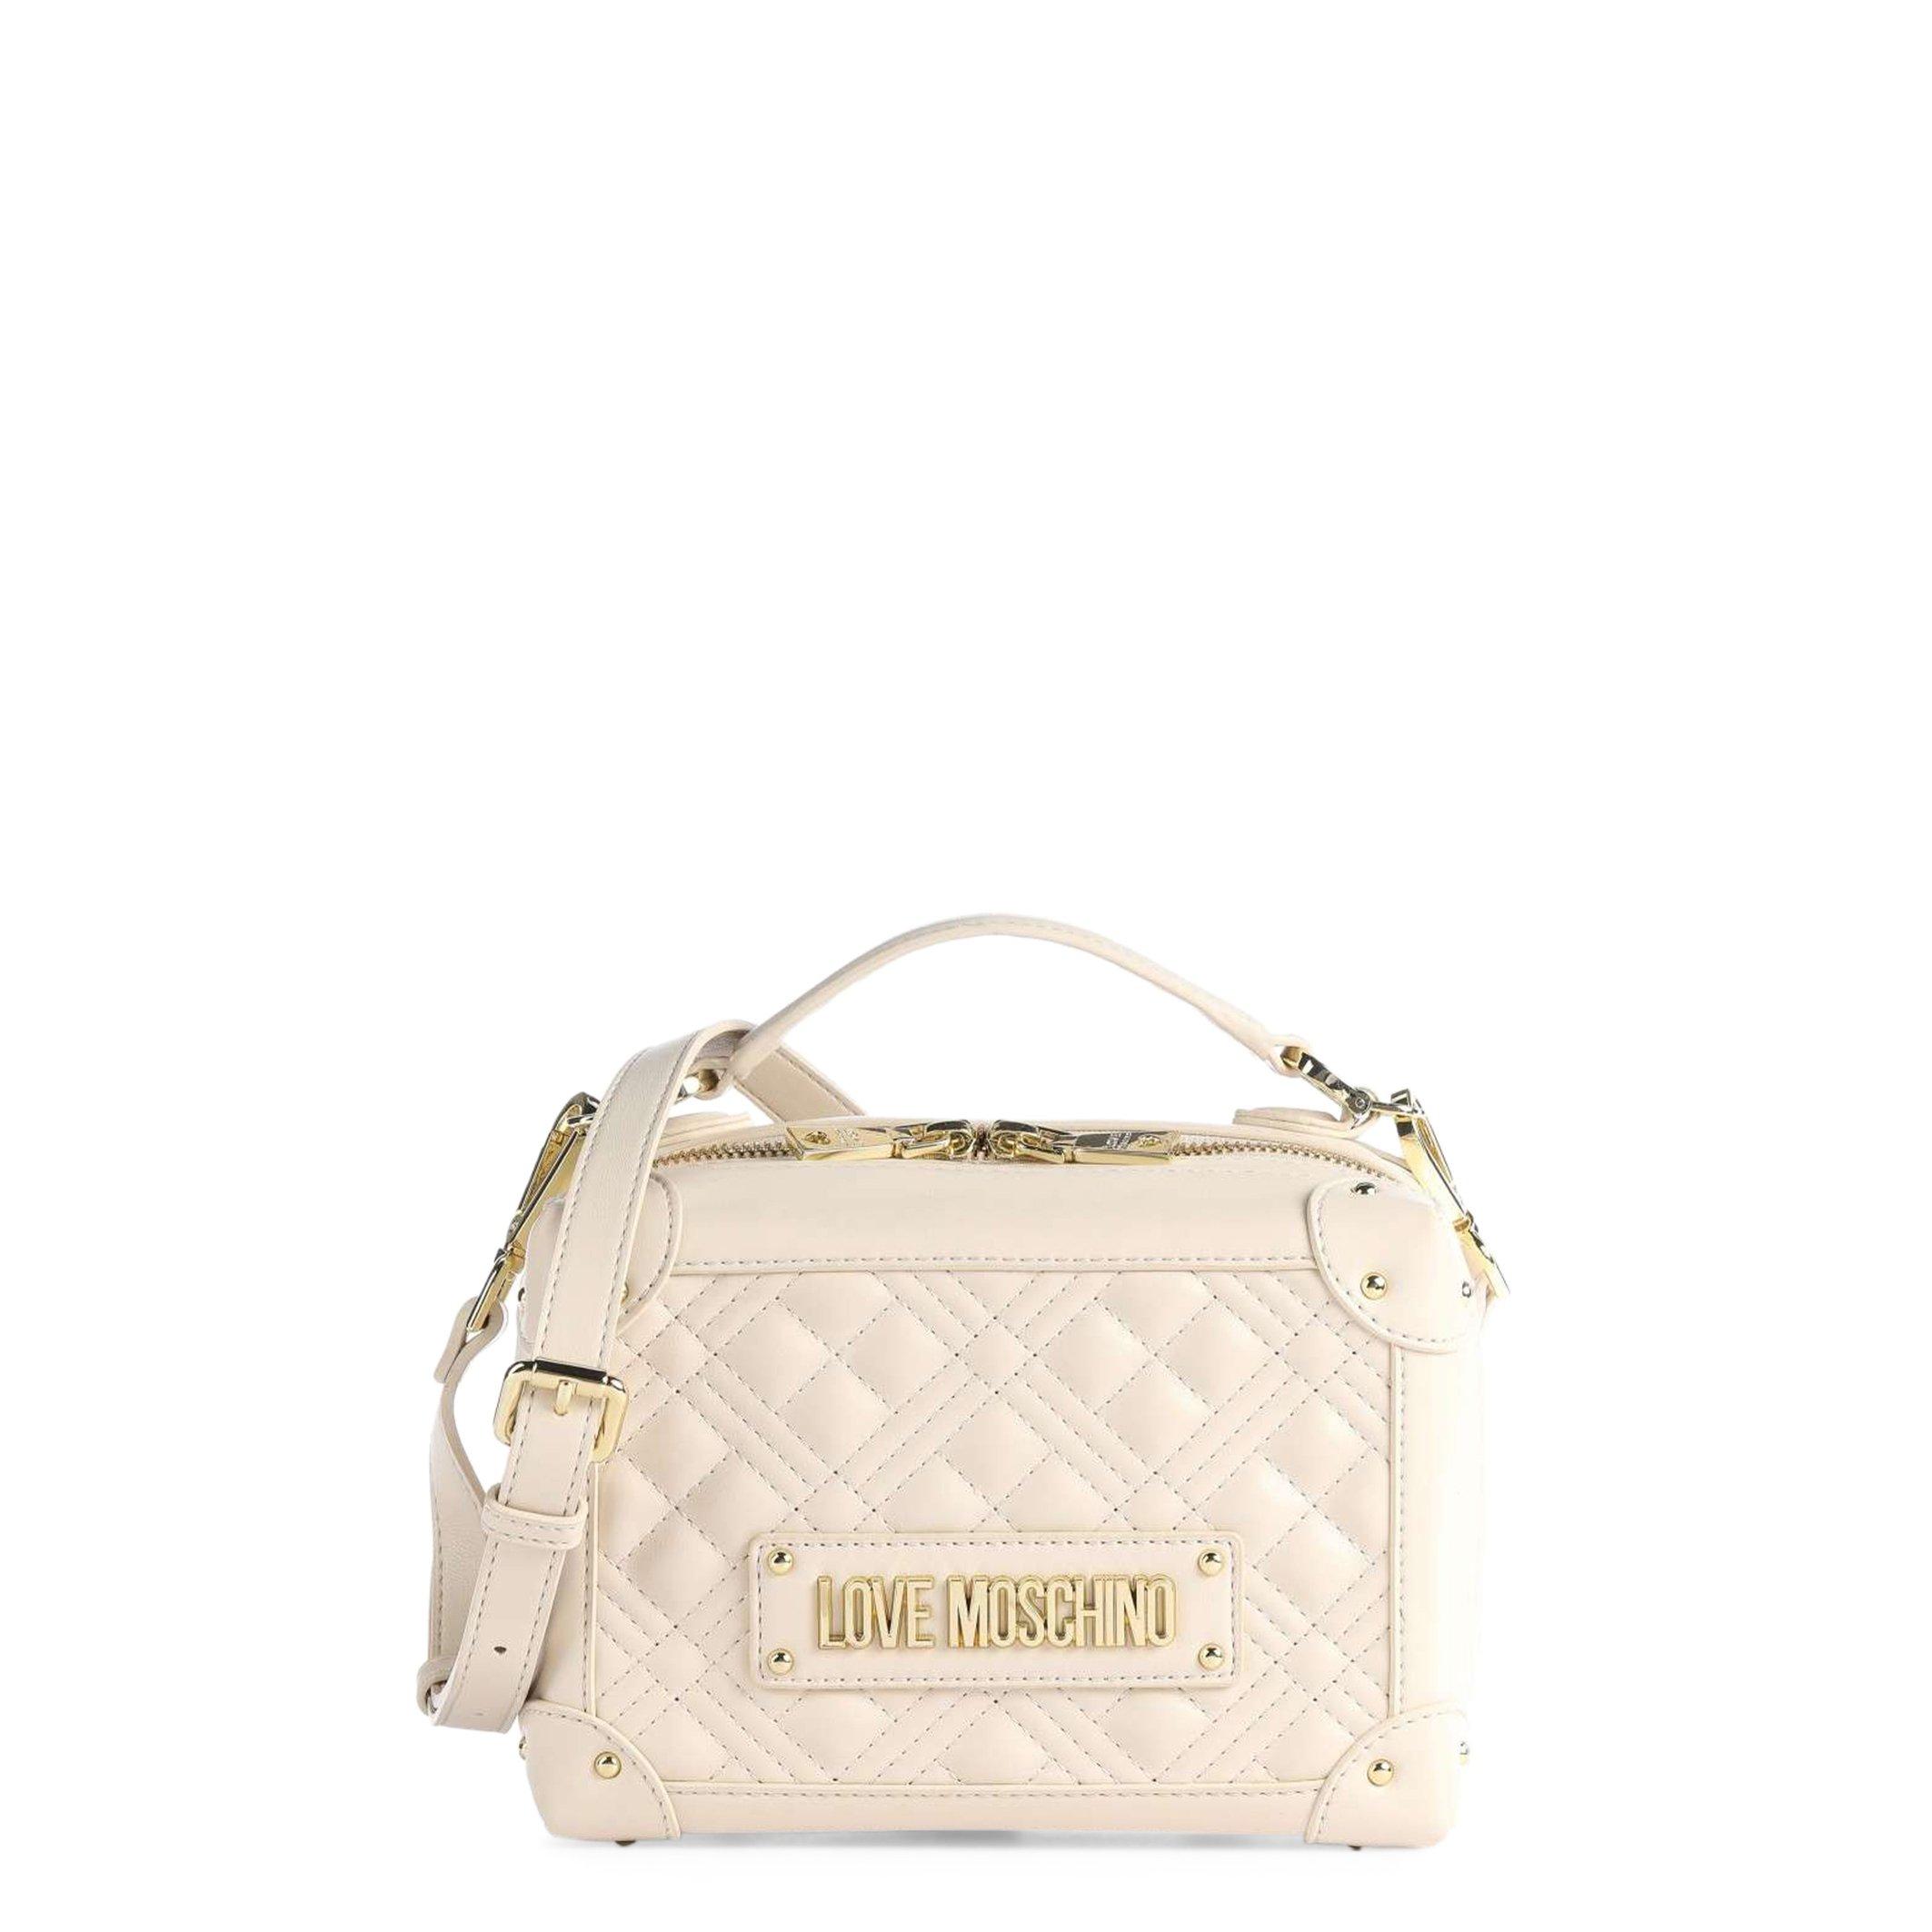 Love Moschino Women's Handbag Various Colours JC4204PP0CKA0 - white NOSIZE